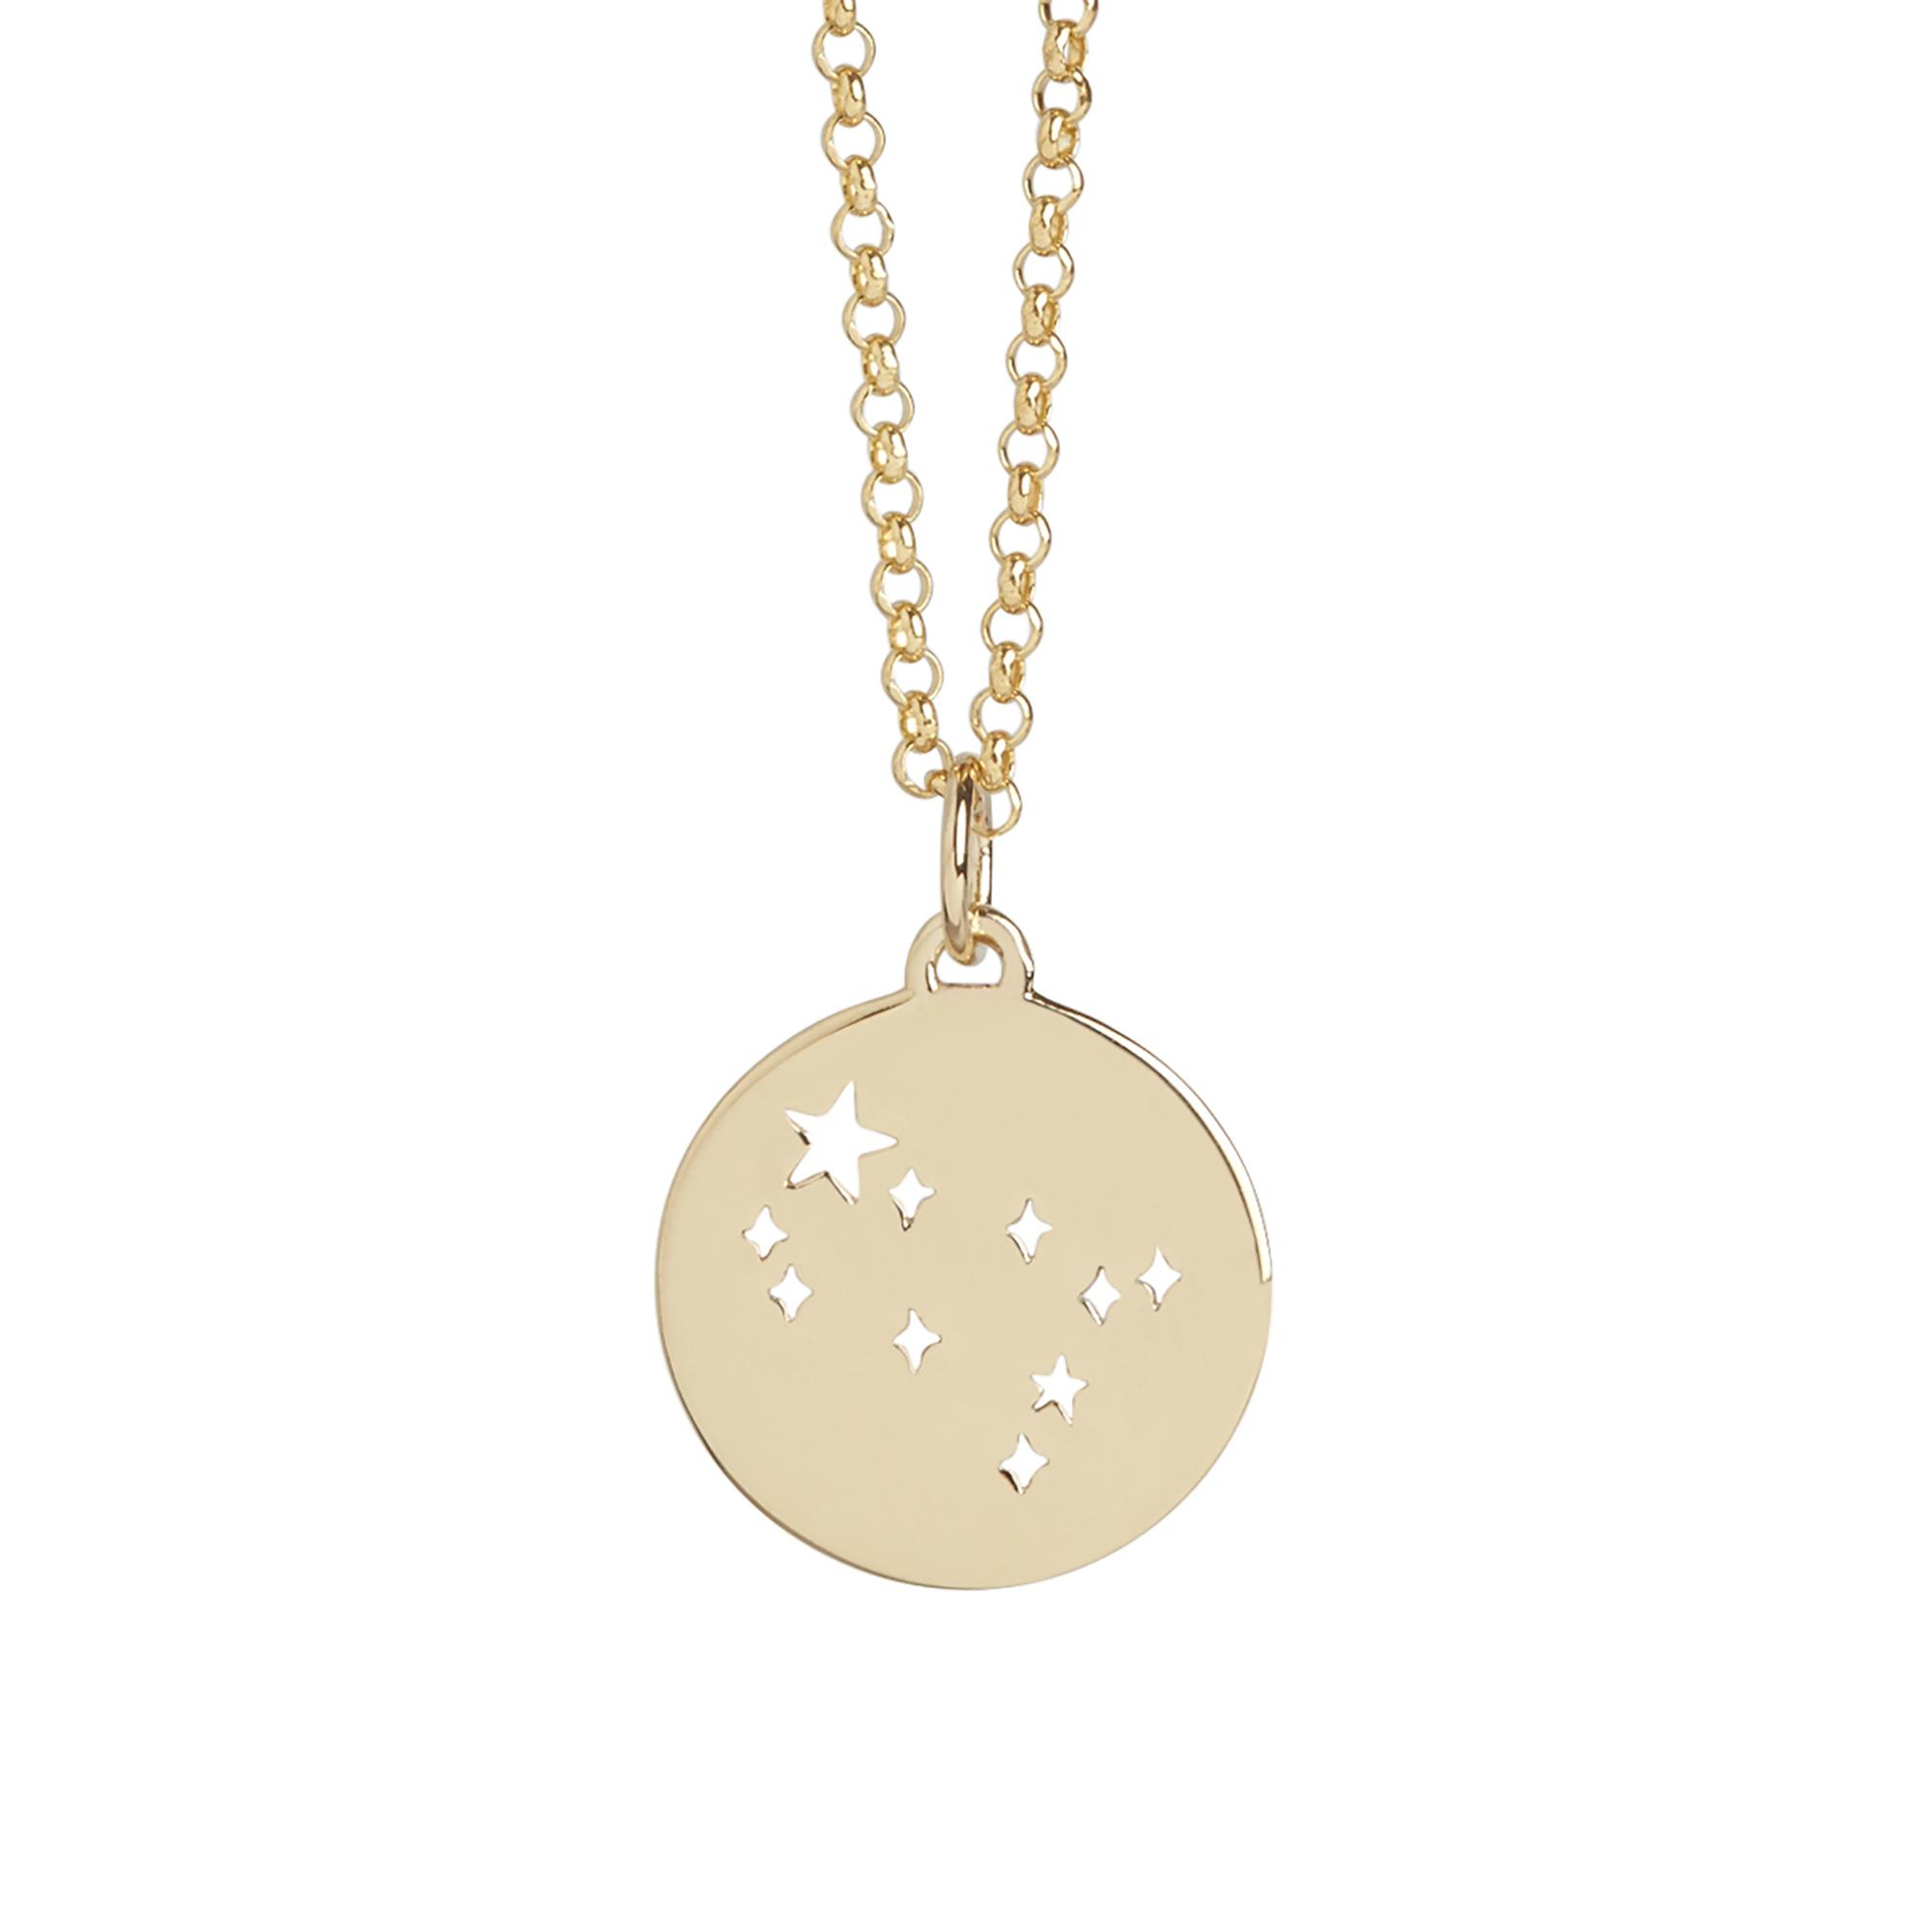 Muru Gemini Gold Plated Star Sign Necklace